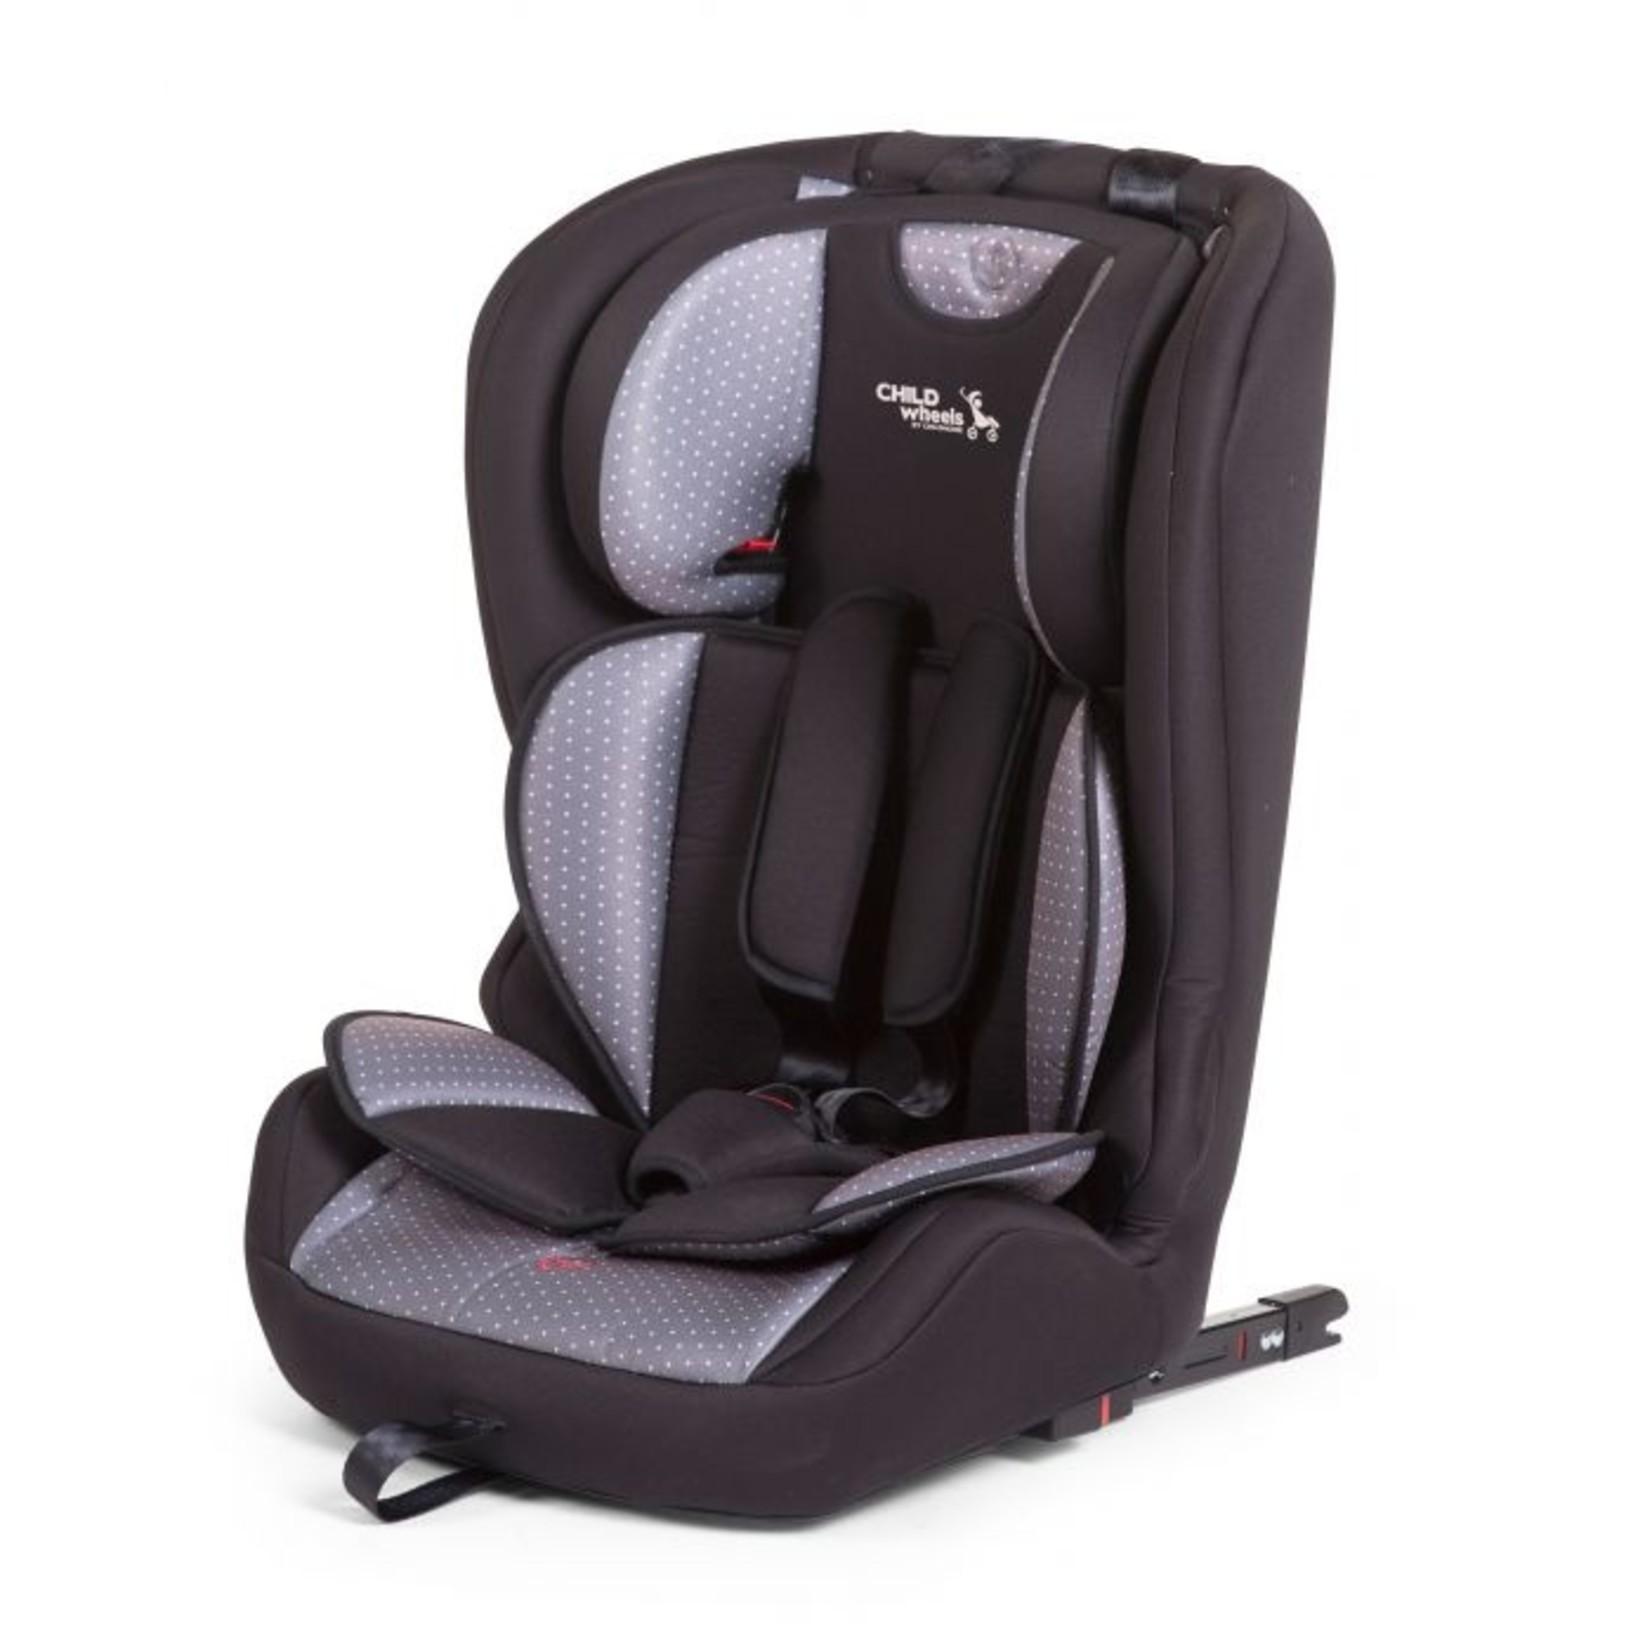 Childhome Childhome Autostoel Groep 1/2/3 Grijs Antracit